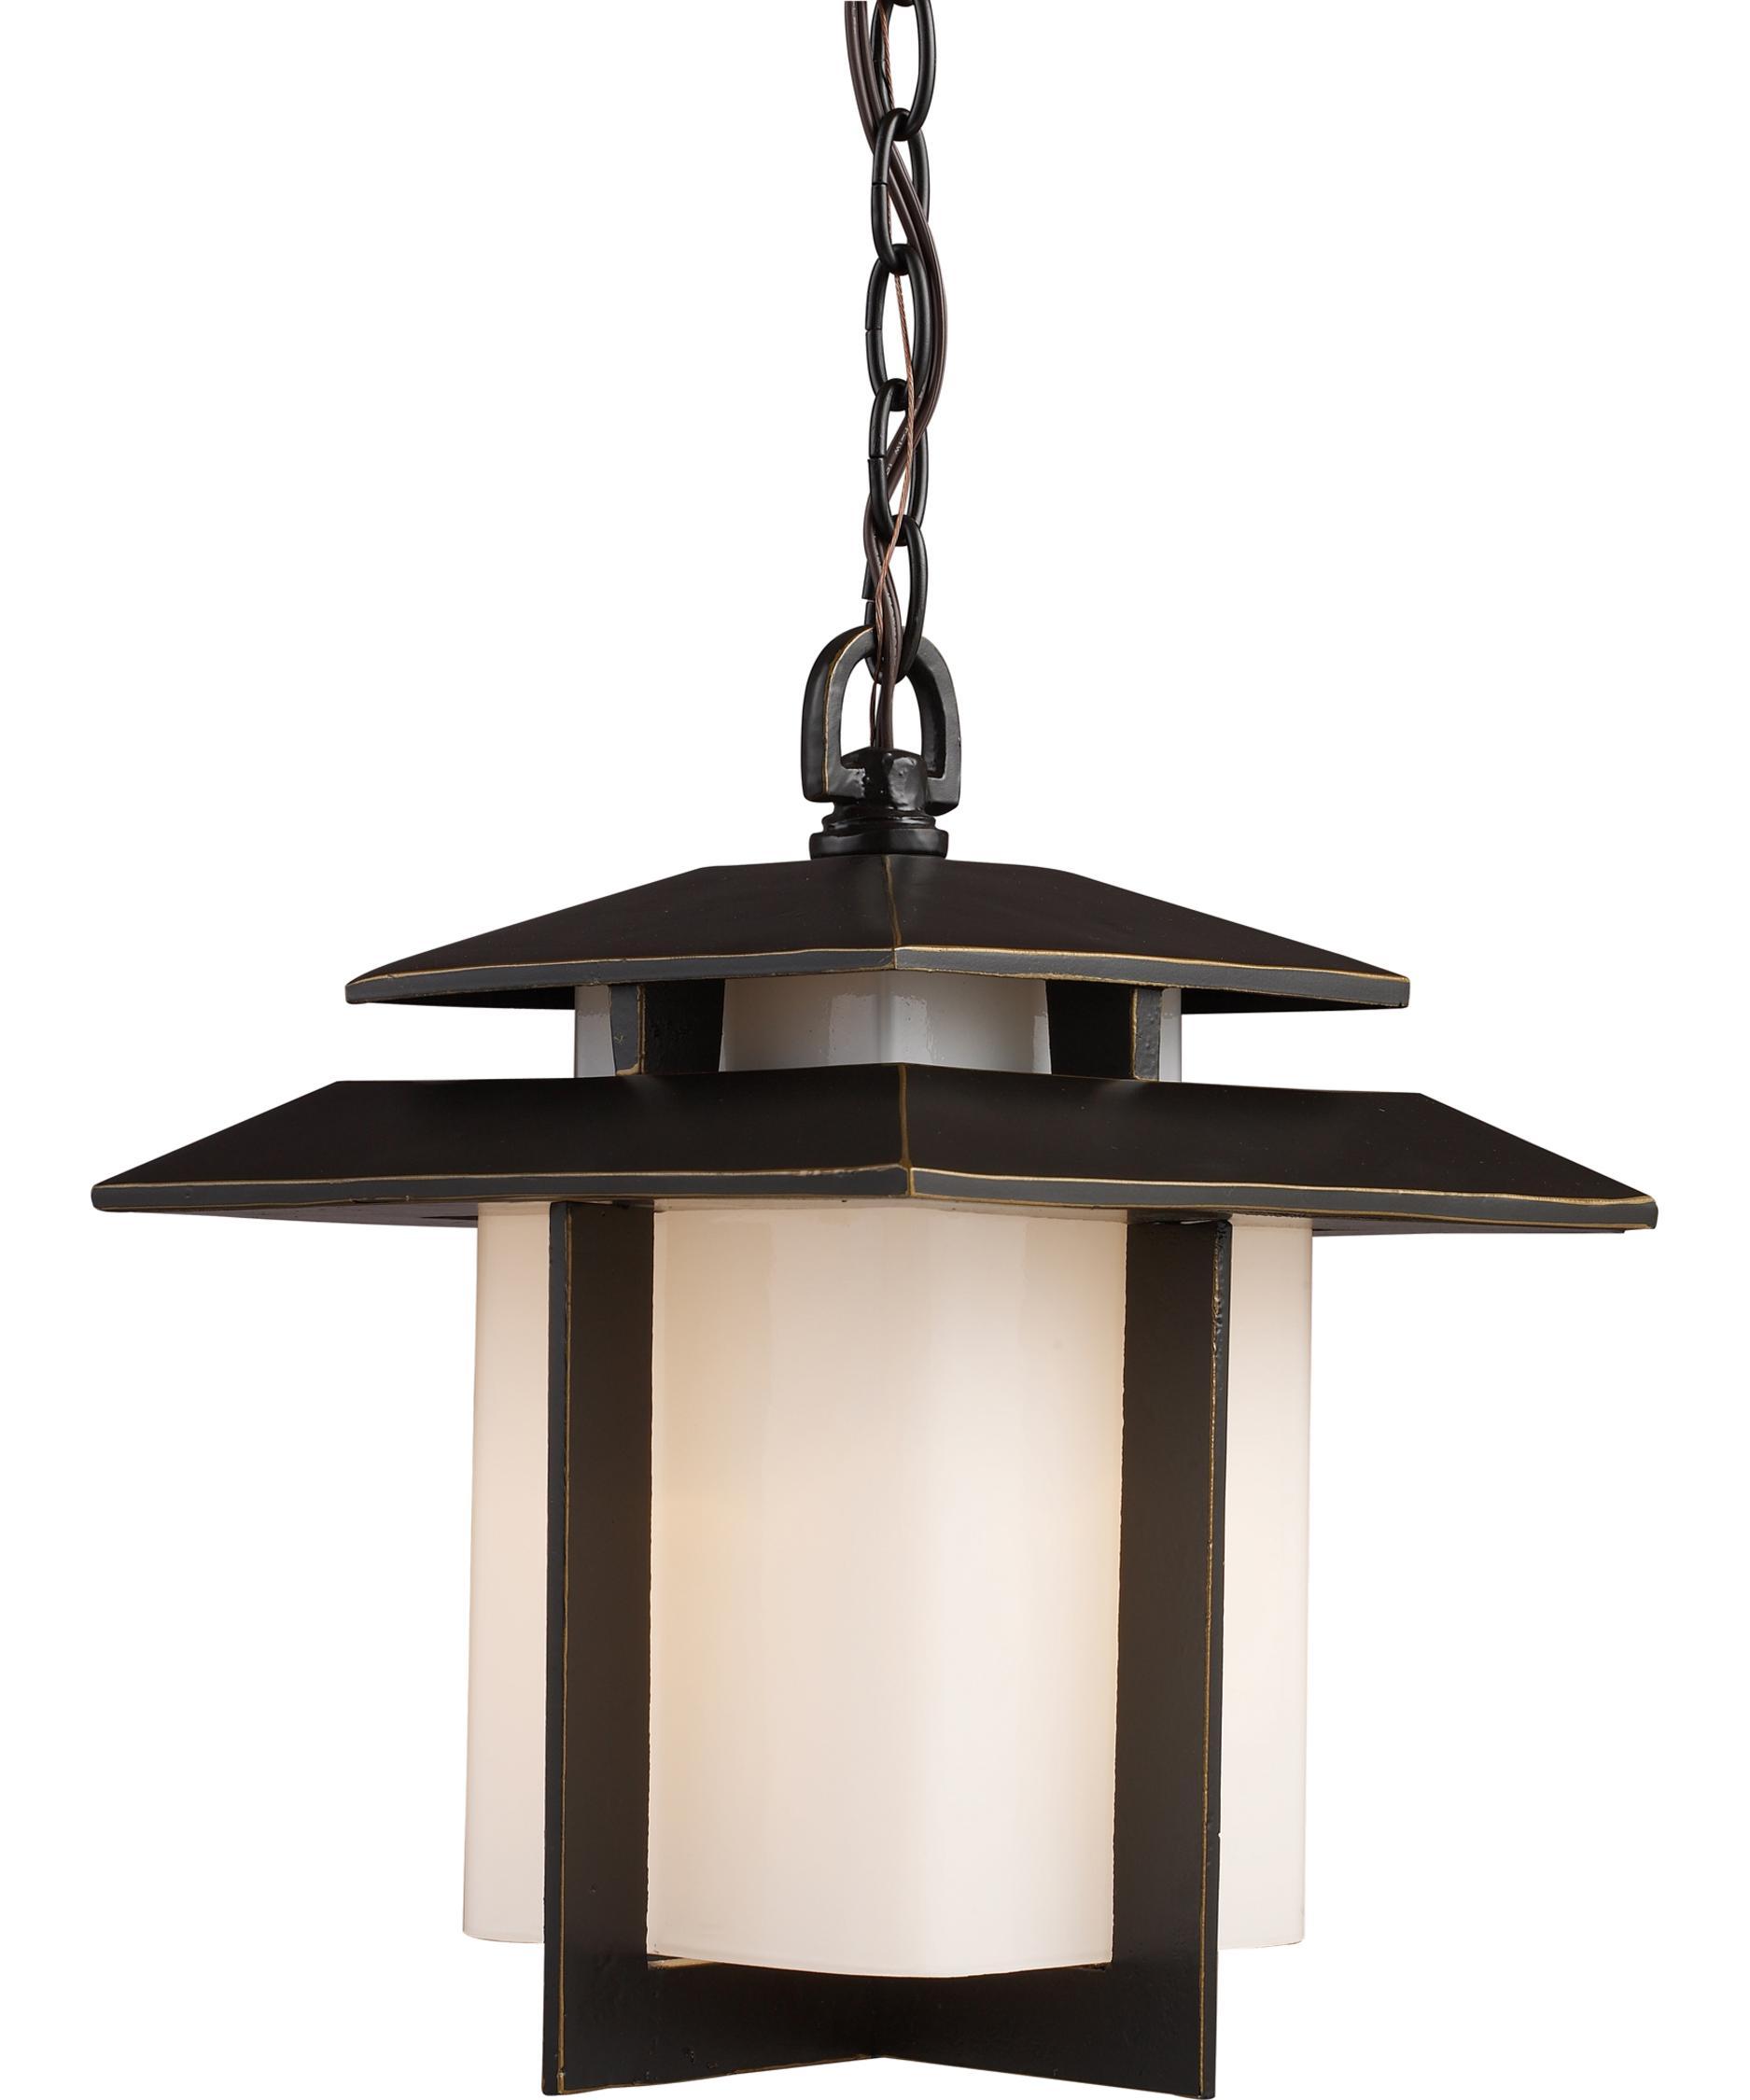 Outdoor hanging lighting - Shown In Hazelnut Bronze Finish And White Glass